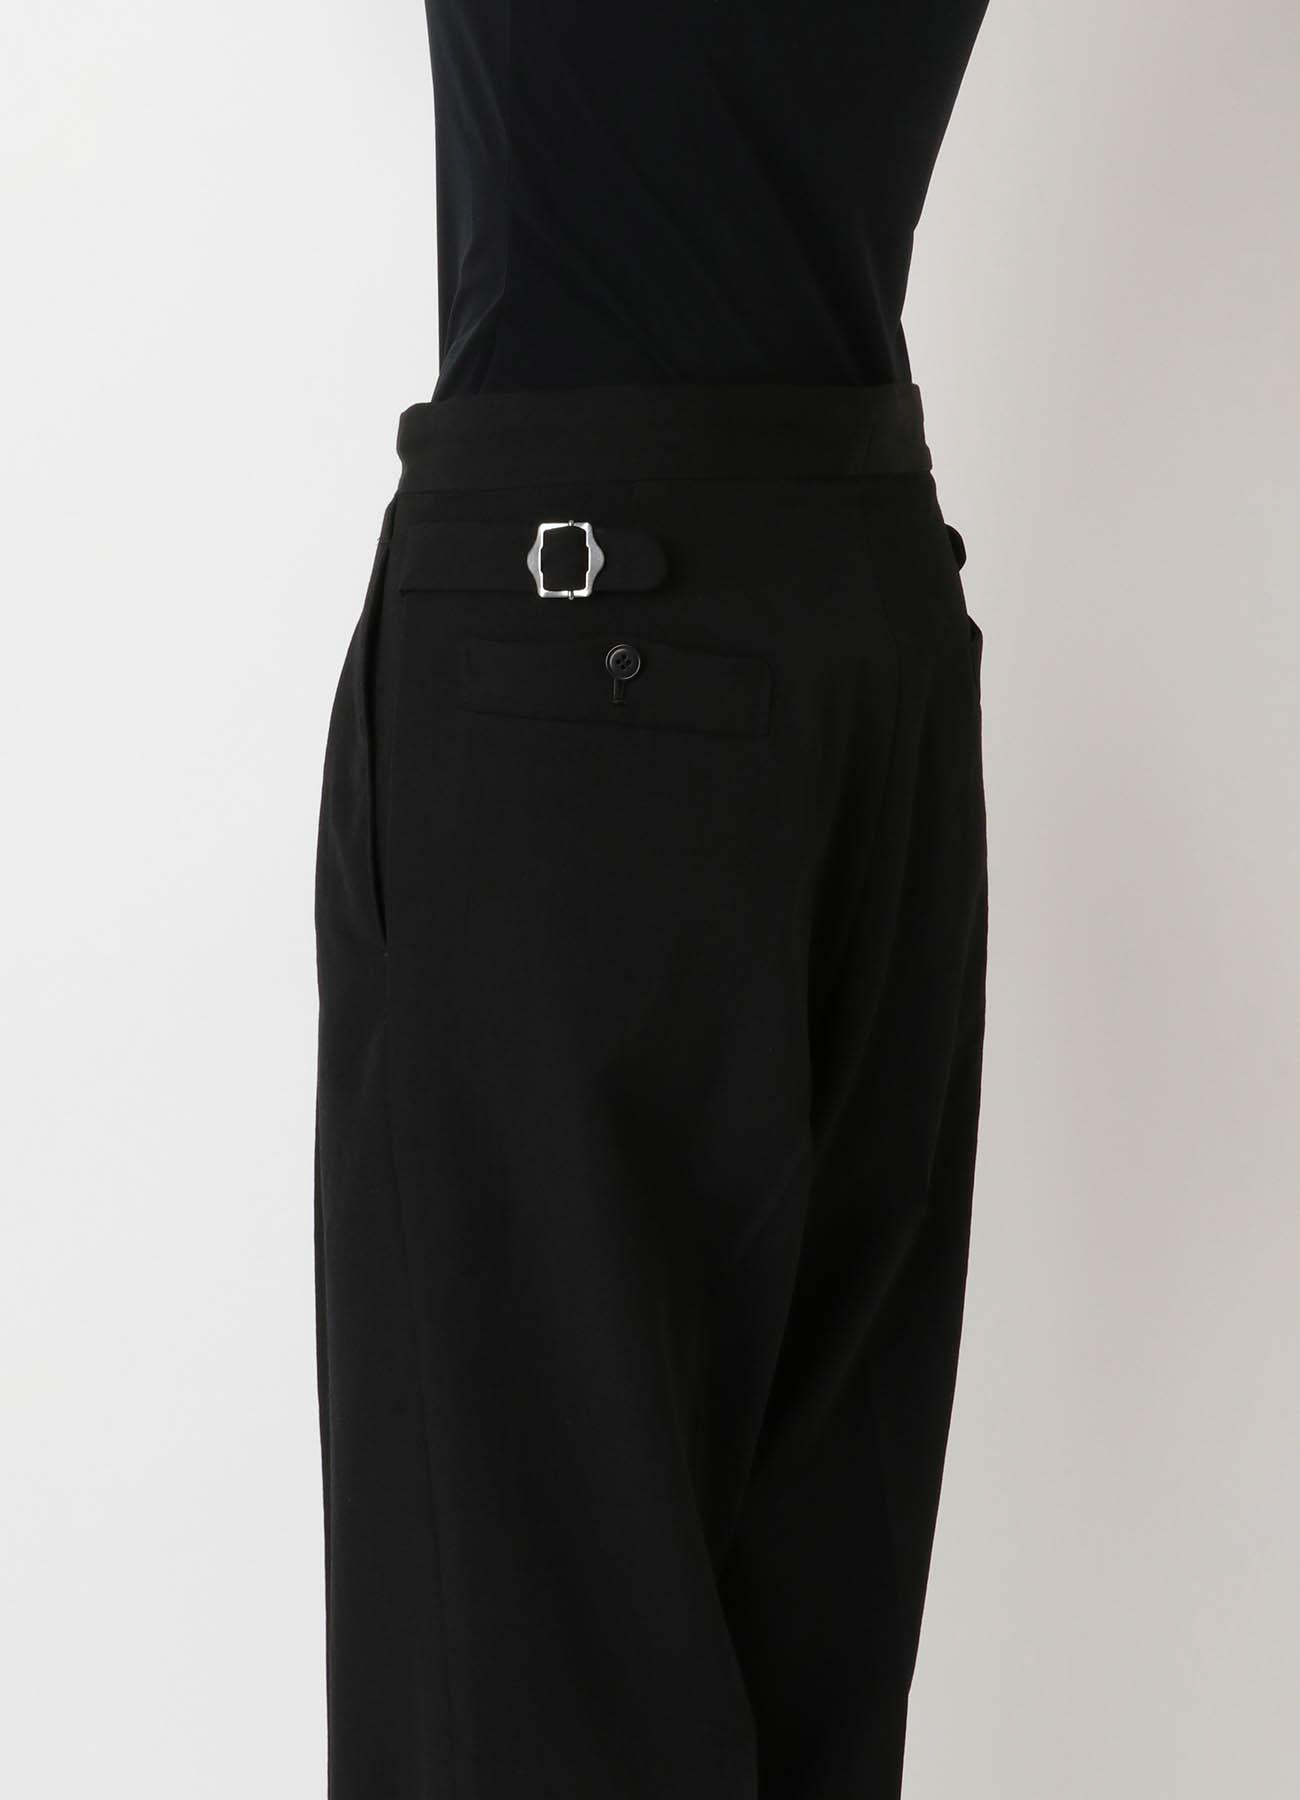 DRY-WASHER GABARDINE TUCK PANTS